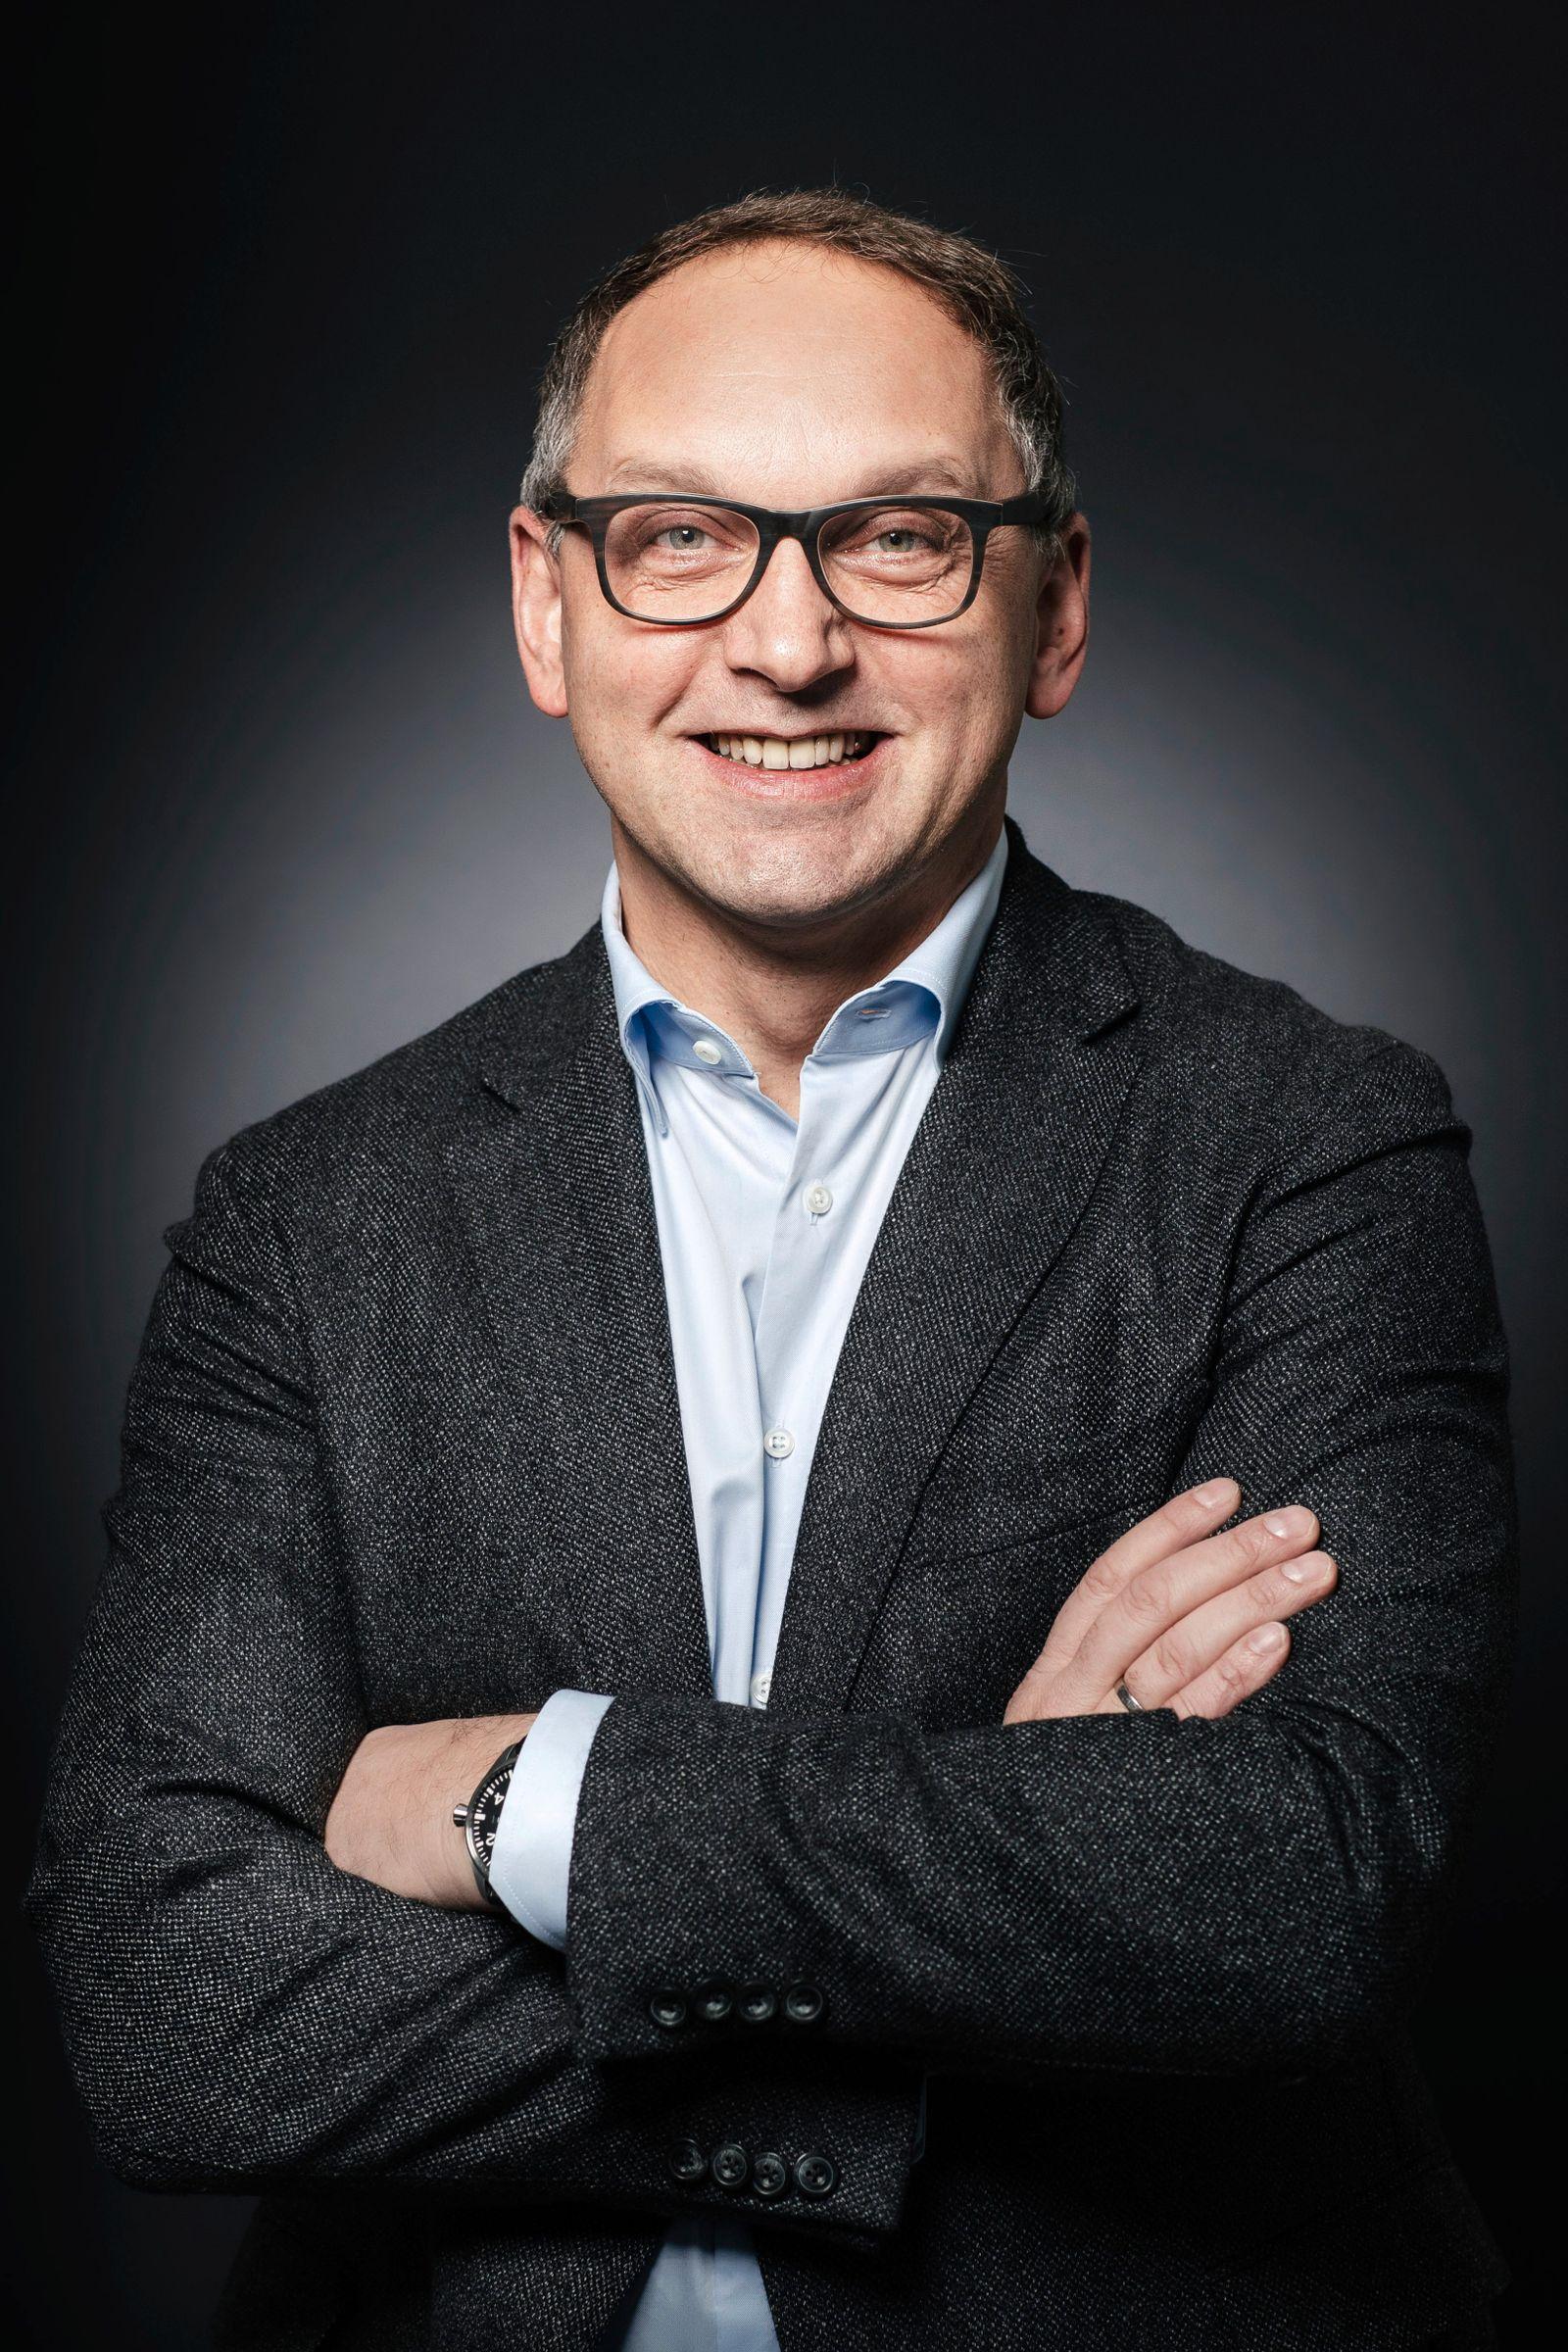 Frank Carsten Herzog